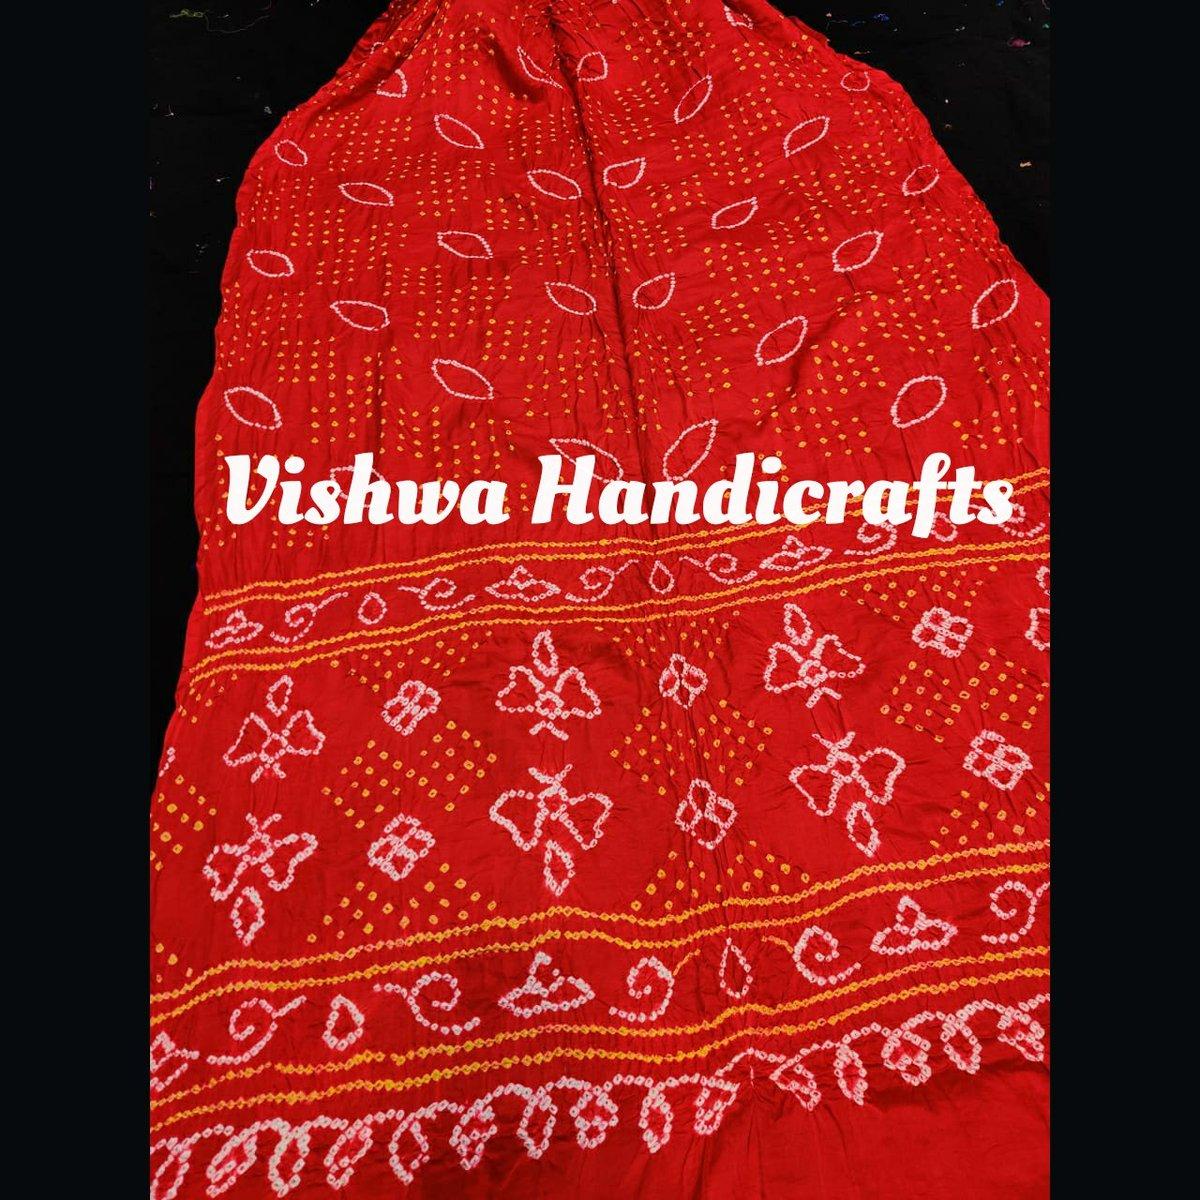 Pure gaji silk bandhej saree.  #puregajisilk #bandhej #saree #vishwahandicrafts #onlineshopping #designer #followforfollow #vocalforvocal #fashion #handmade #Handcrafted #artisaninspiration #traditional #smallbusiness #gajisilkchat #bandhejchat